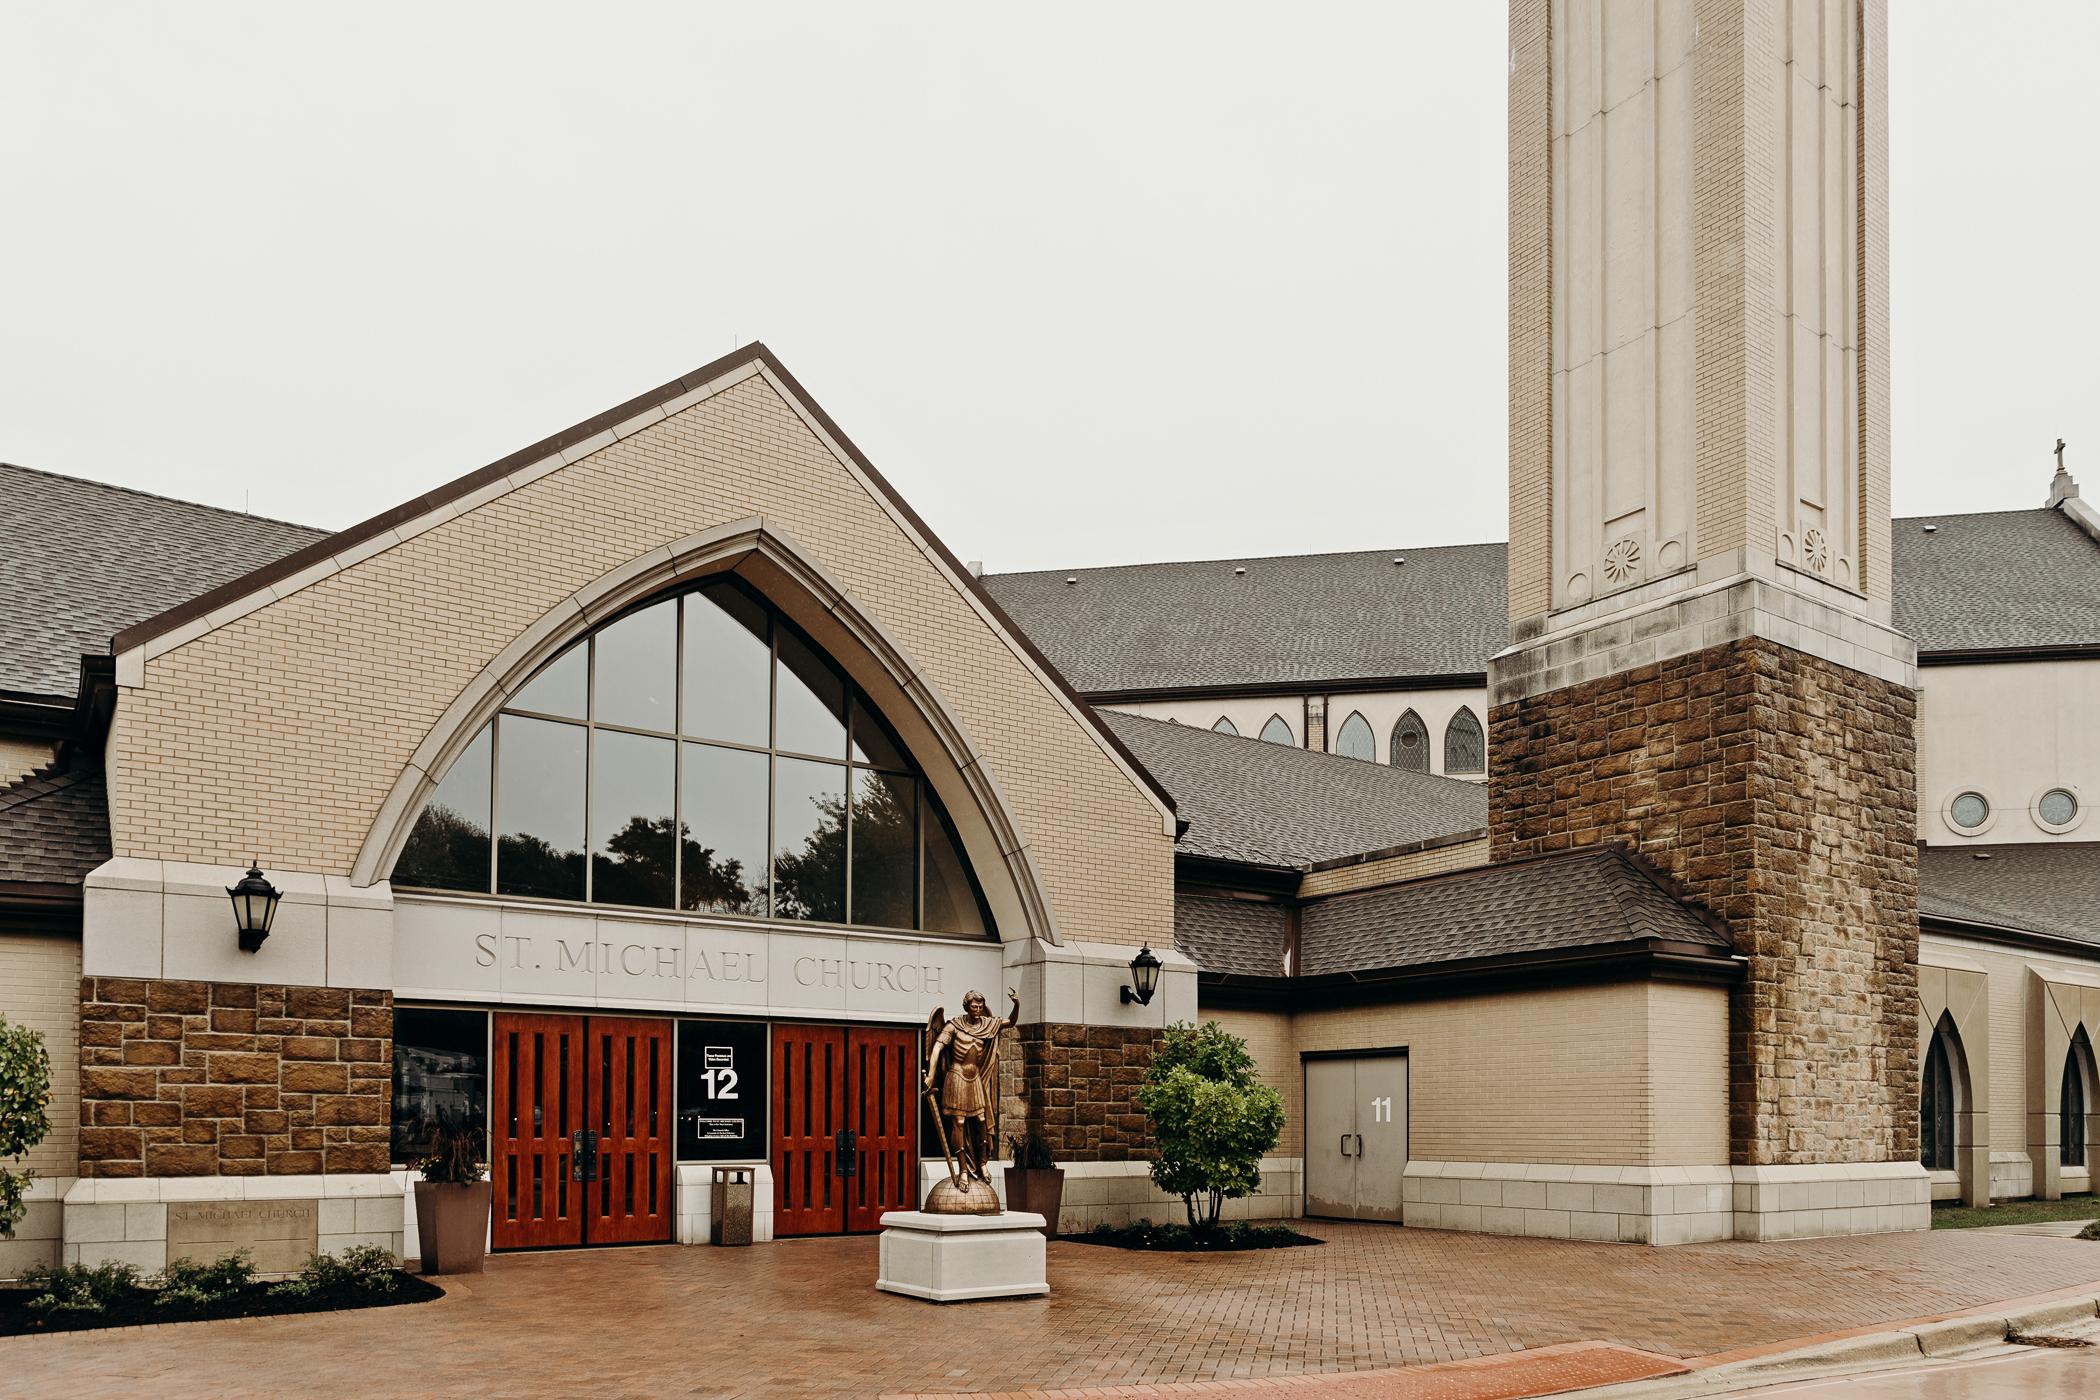 St. Michael Catholic Church in Wheaton, IL